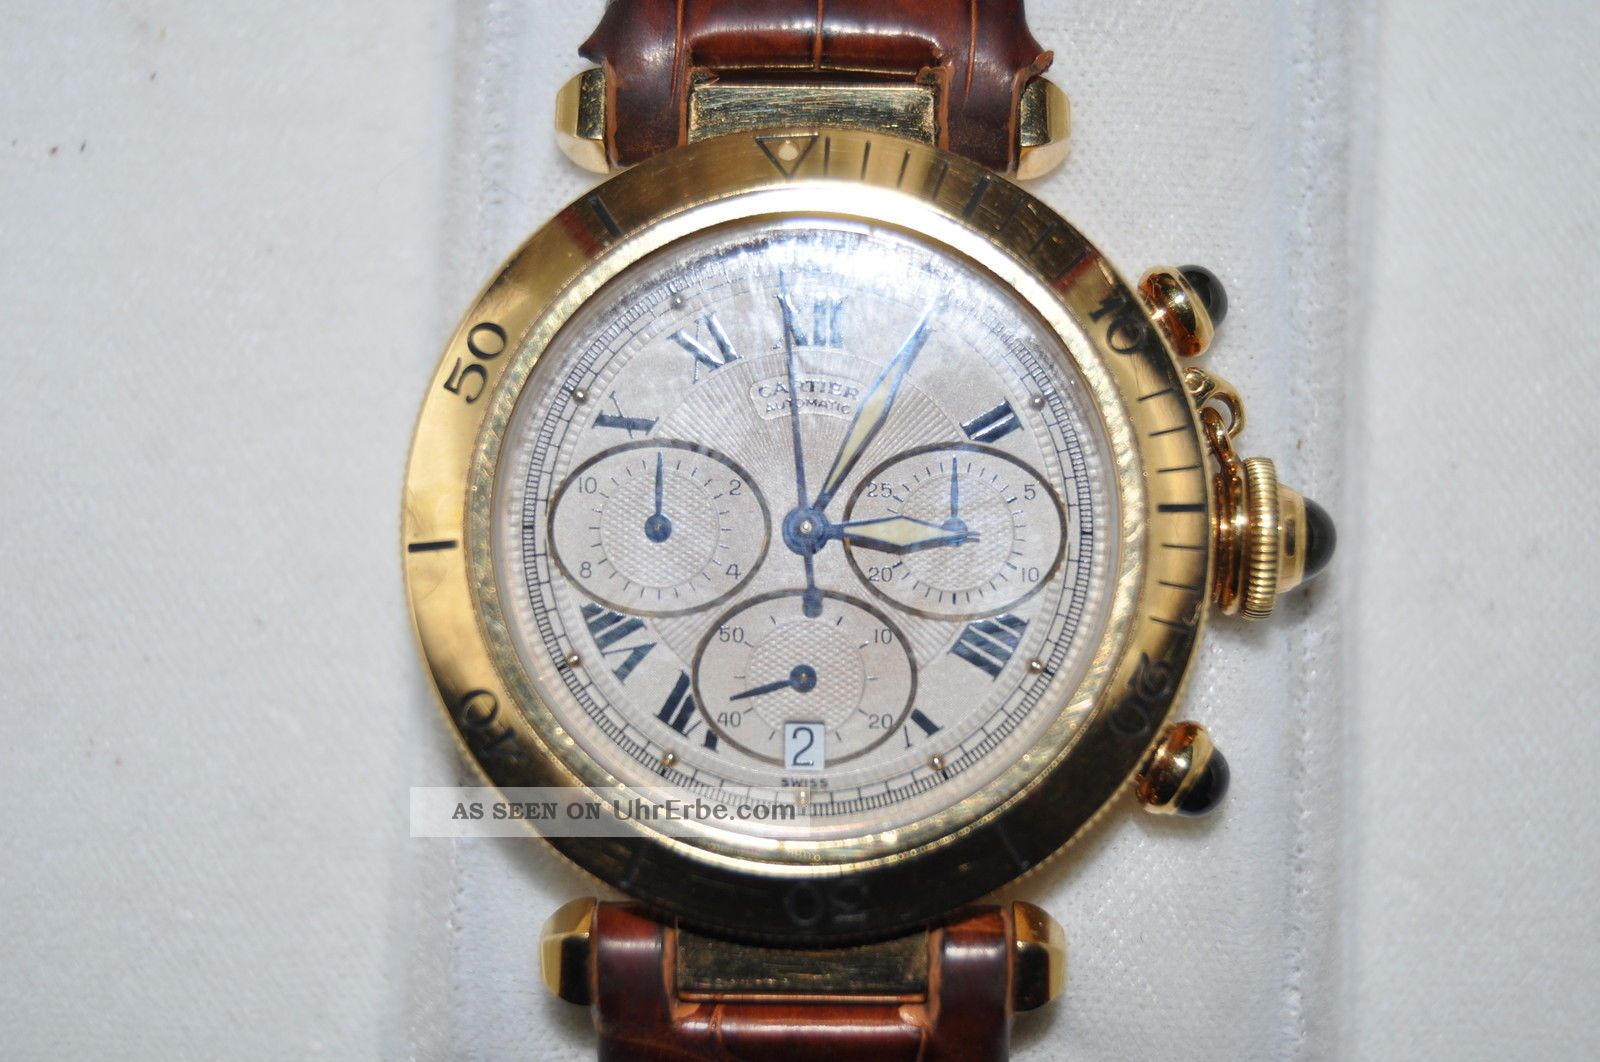 Cartier Pasha Chrono 18 Carat Gold Mit Box Getragen Armbanduhren Bild